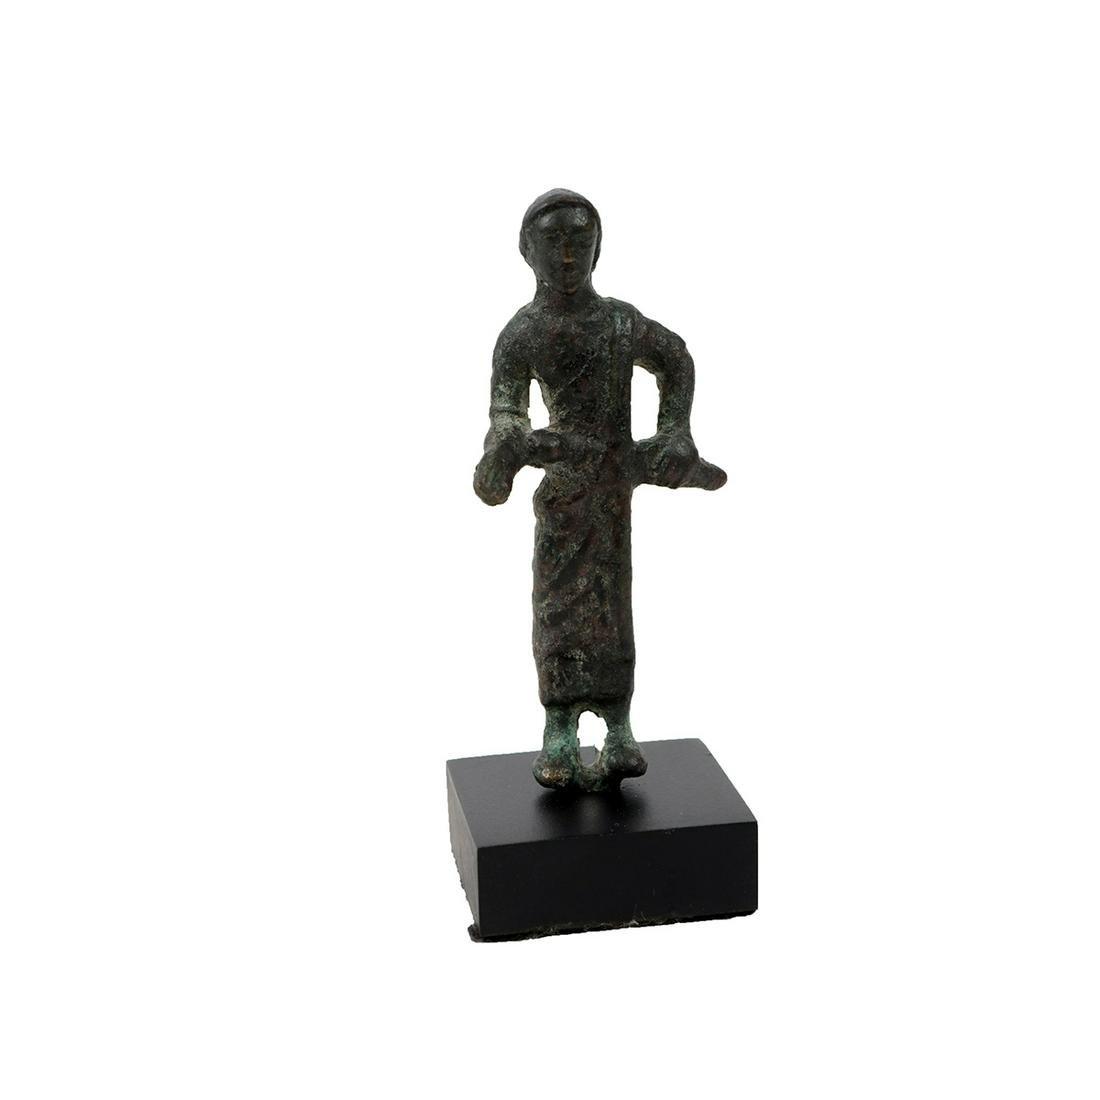 Ancient Roman bronze figure of a man c.1st-2nd century